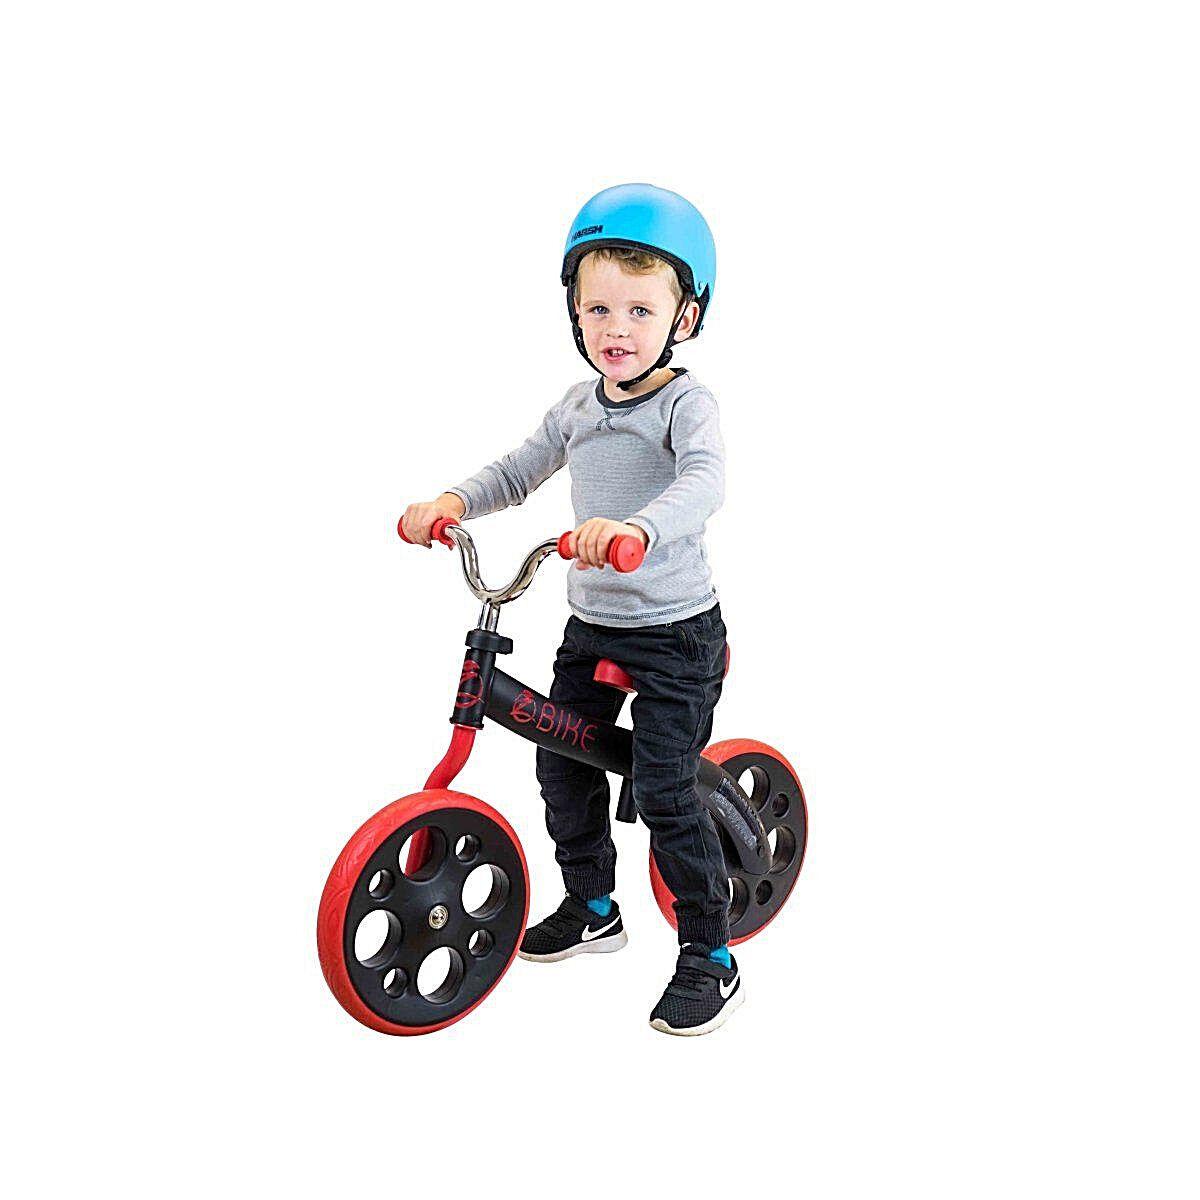 Ab 3 J.  Super Cooles Z Bike 12 Zoll Lauflernrad Kinder Laufrad Rennrad Feeling